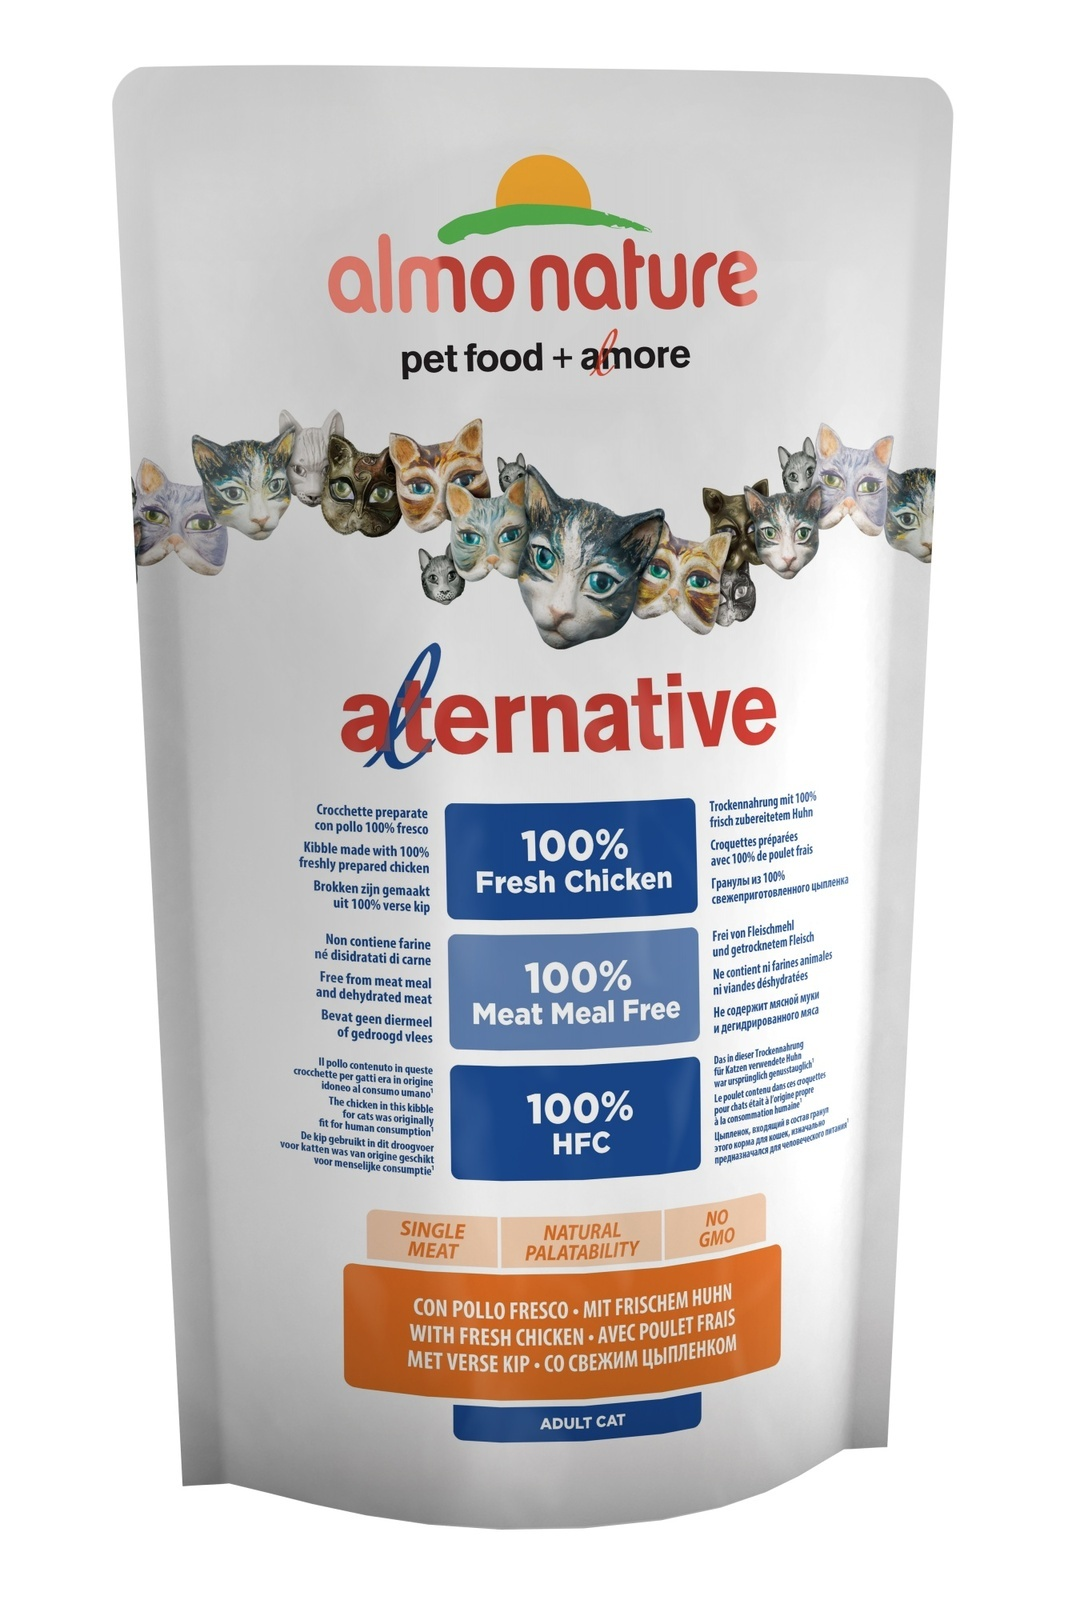 Almo Nature Alternative ВИА Корм со свежим цыпленком (55 % мяса) для кошек (Alternative Chicken and Rice) 7852, 0,750 кг, 20631